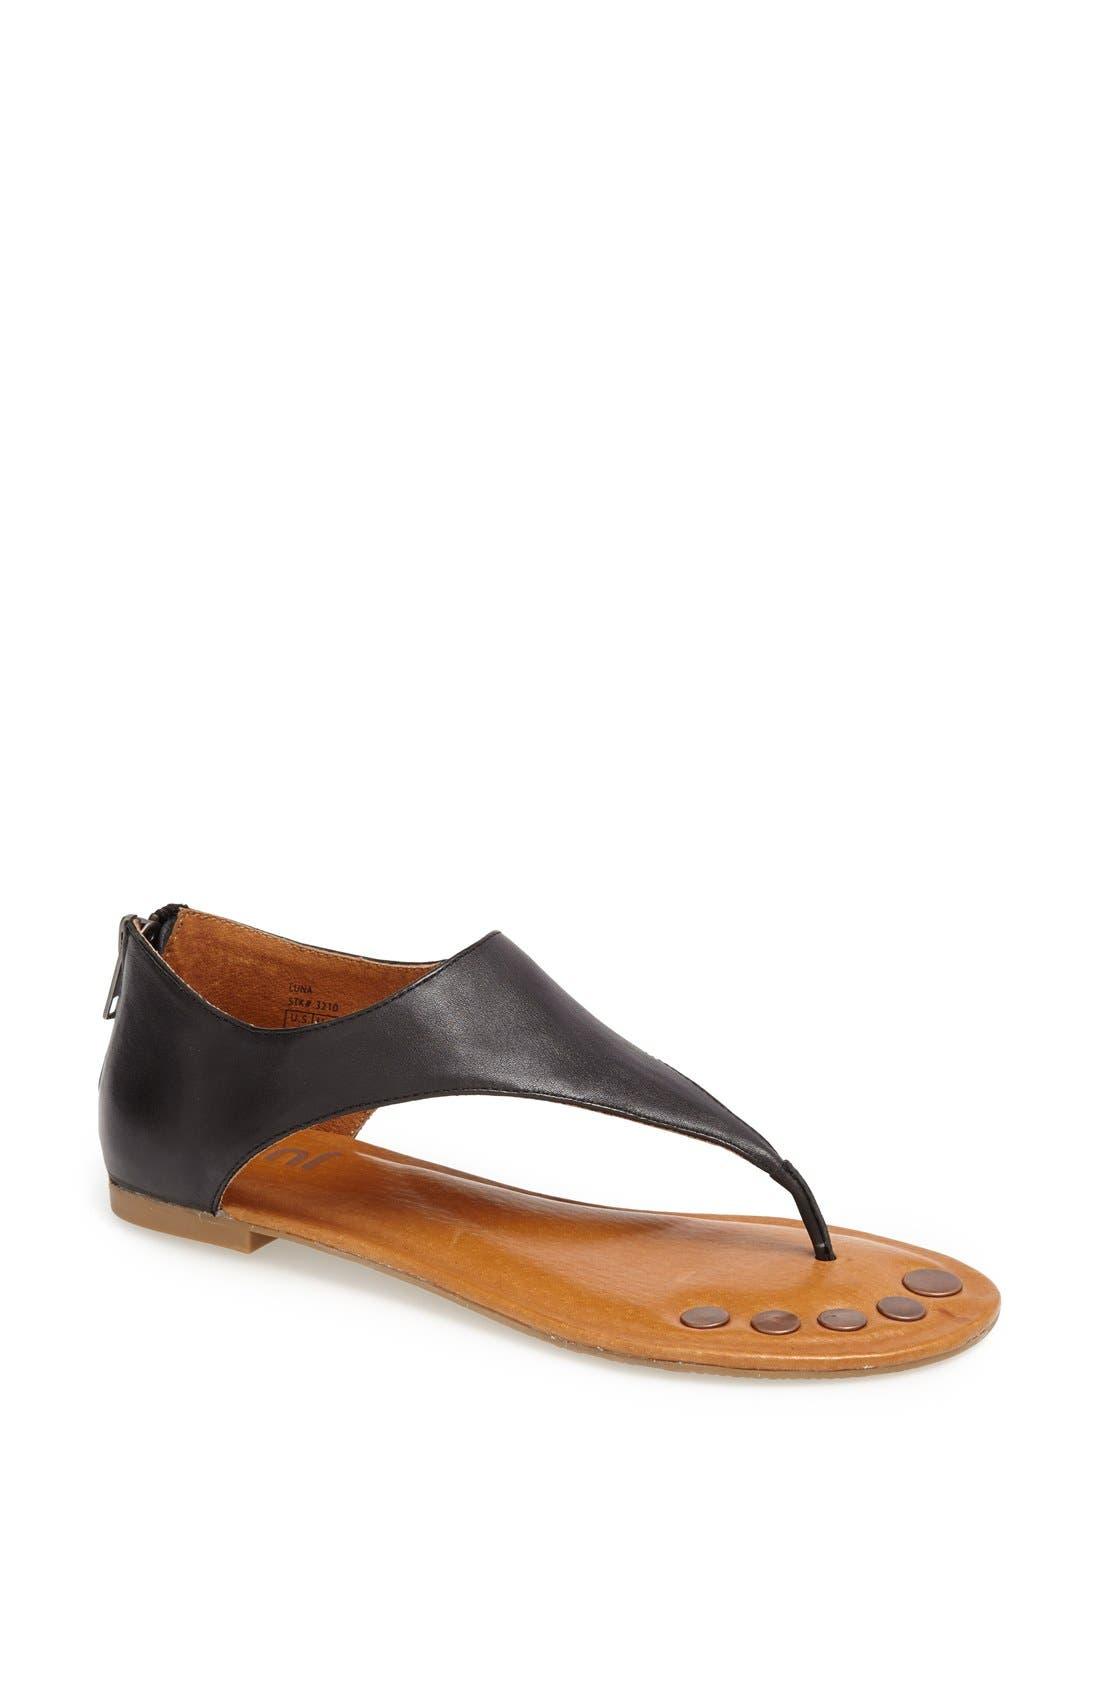 'Luna' Metallic Leather Thong Sandal, Main, color, 010